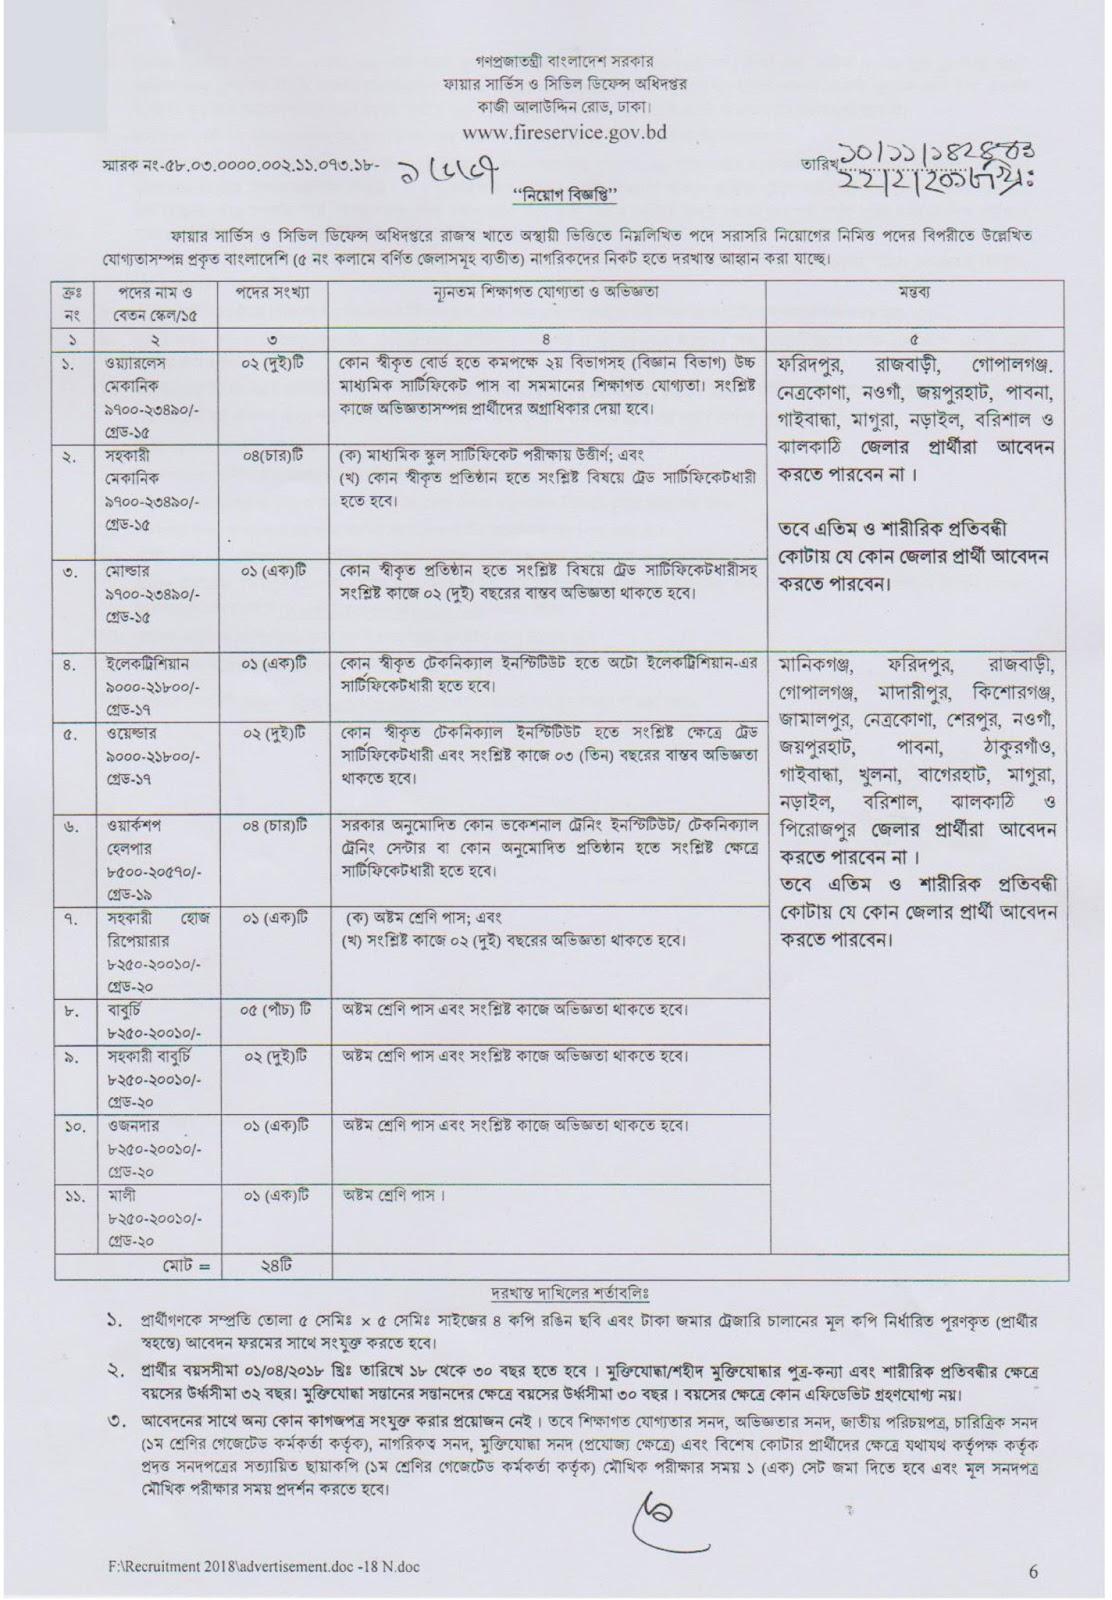 Bangladesh Fire Service and Civil Defense (FSCD) Job Circular 2018